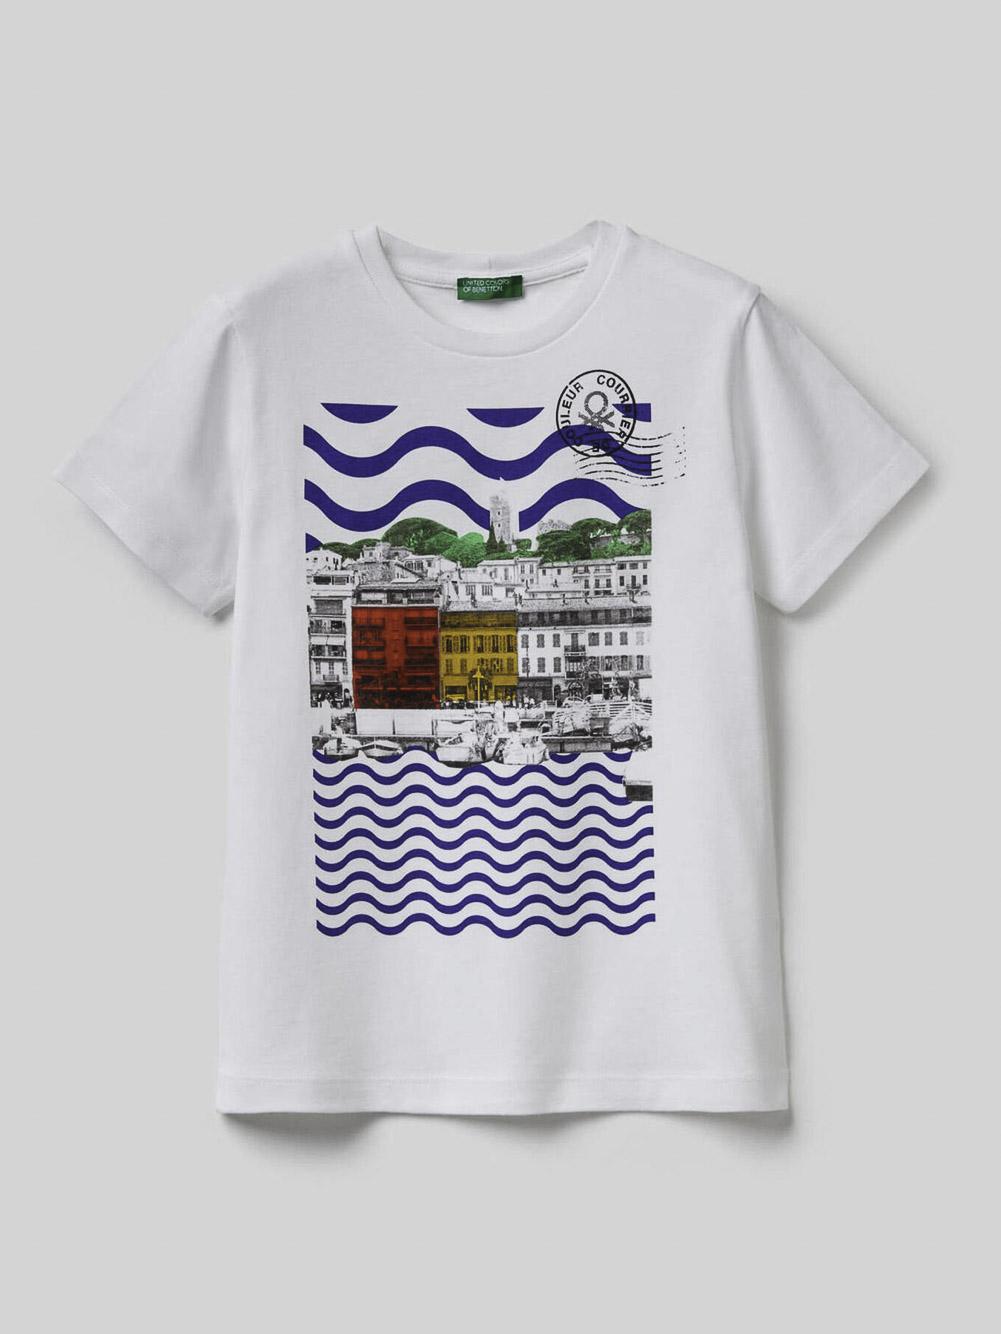 012 BENETTON Μπλούζα t-shirt 3096C14OU 20P901